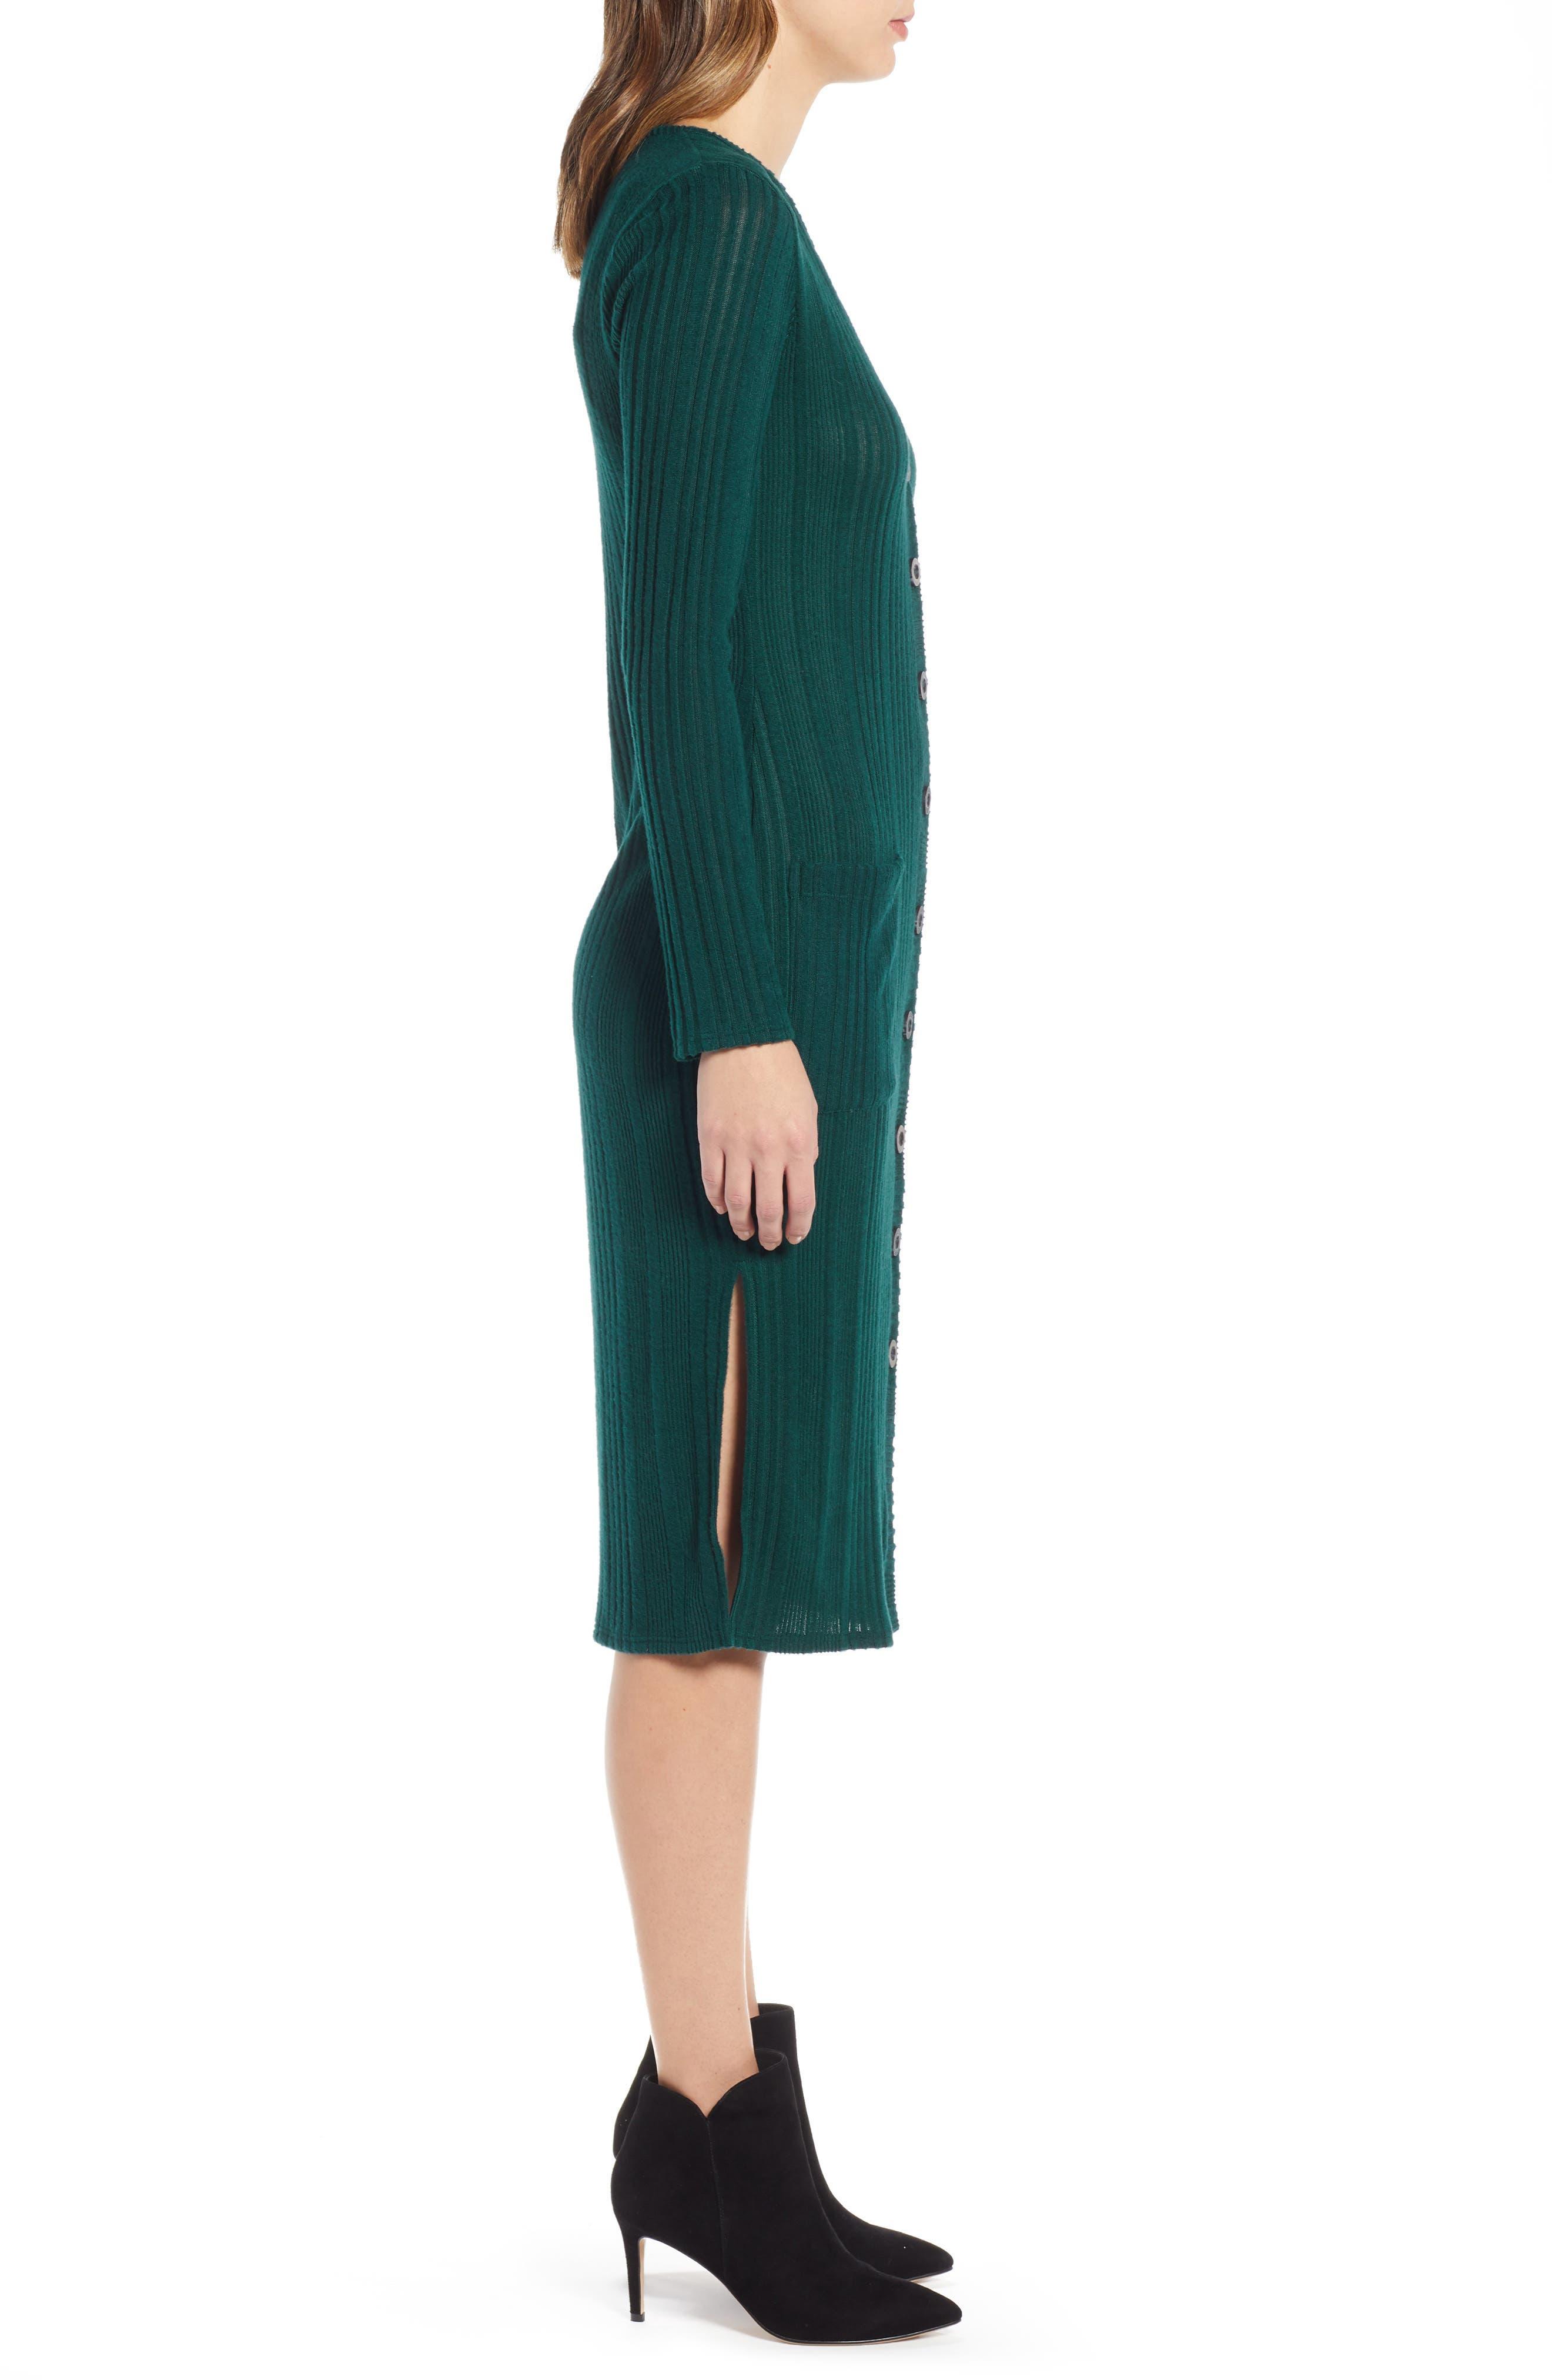 SOCIALITE,                             Sweater Dress,                             Alternate thumbnail 3, color,                             300